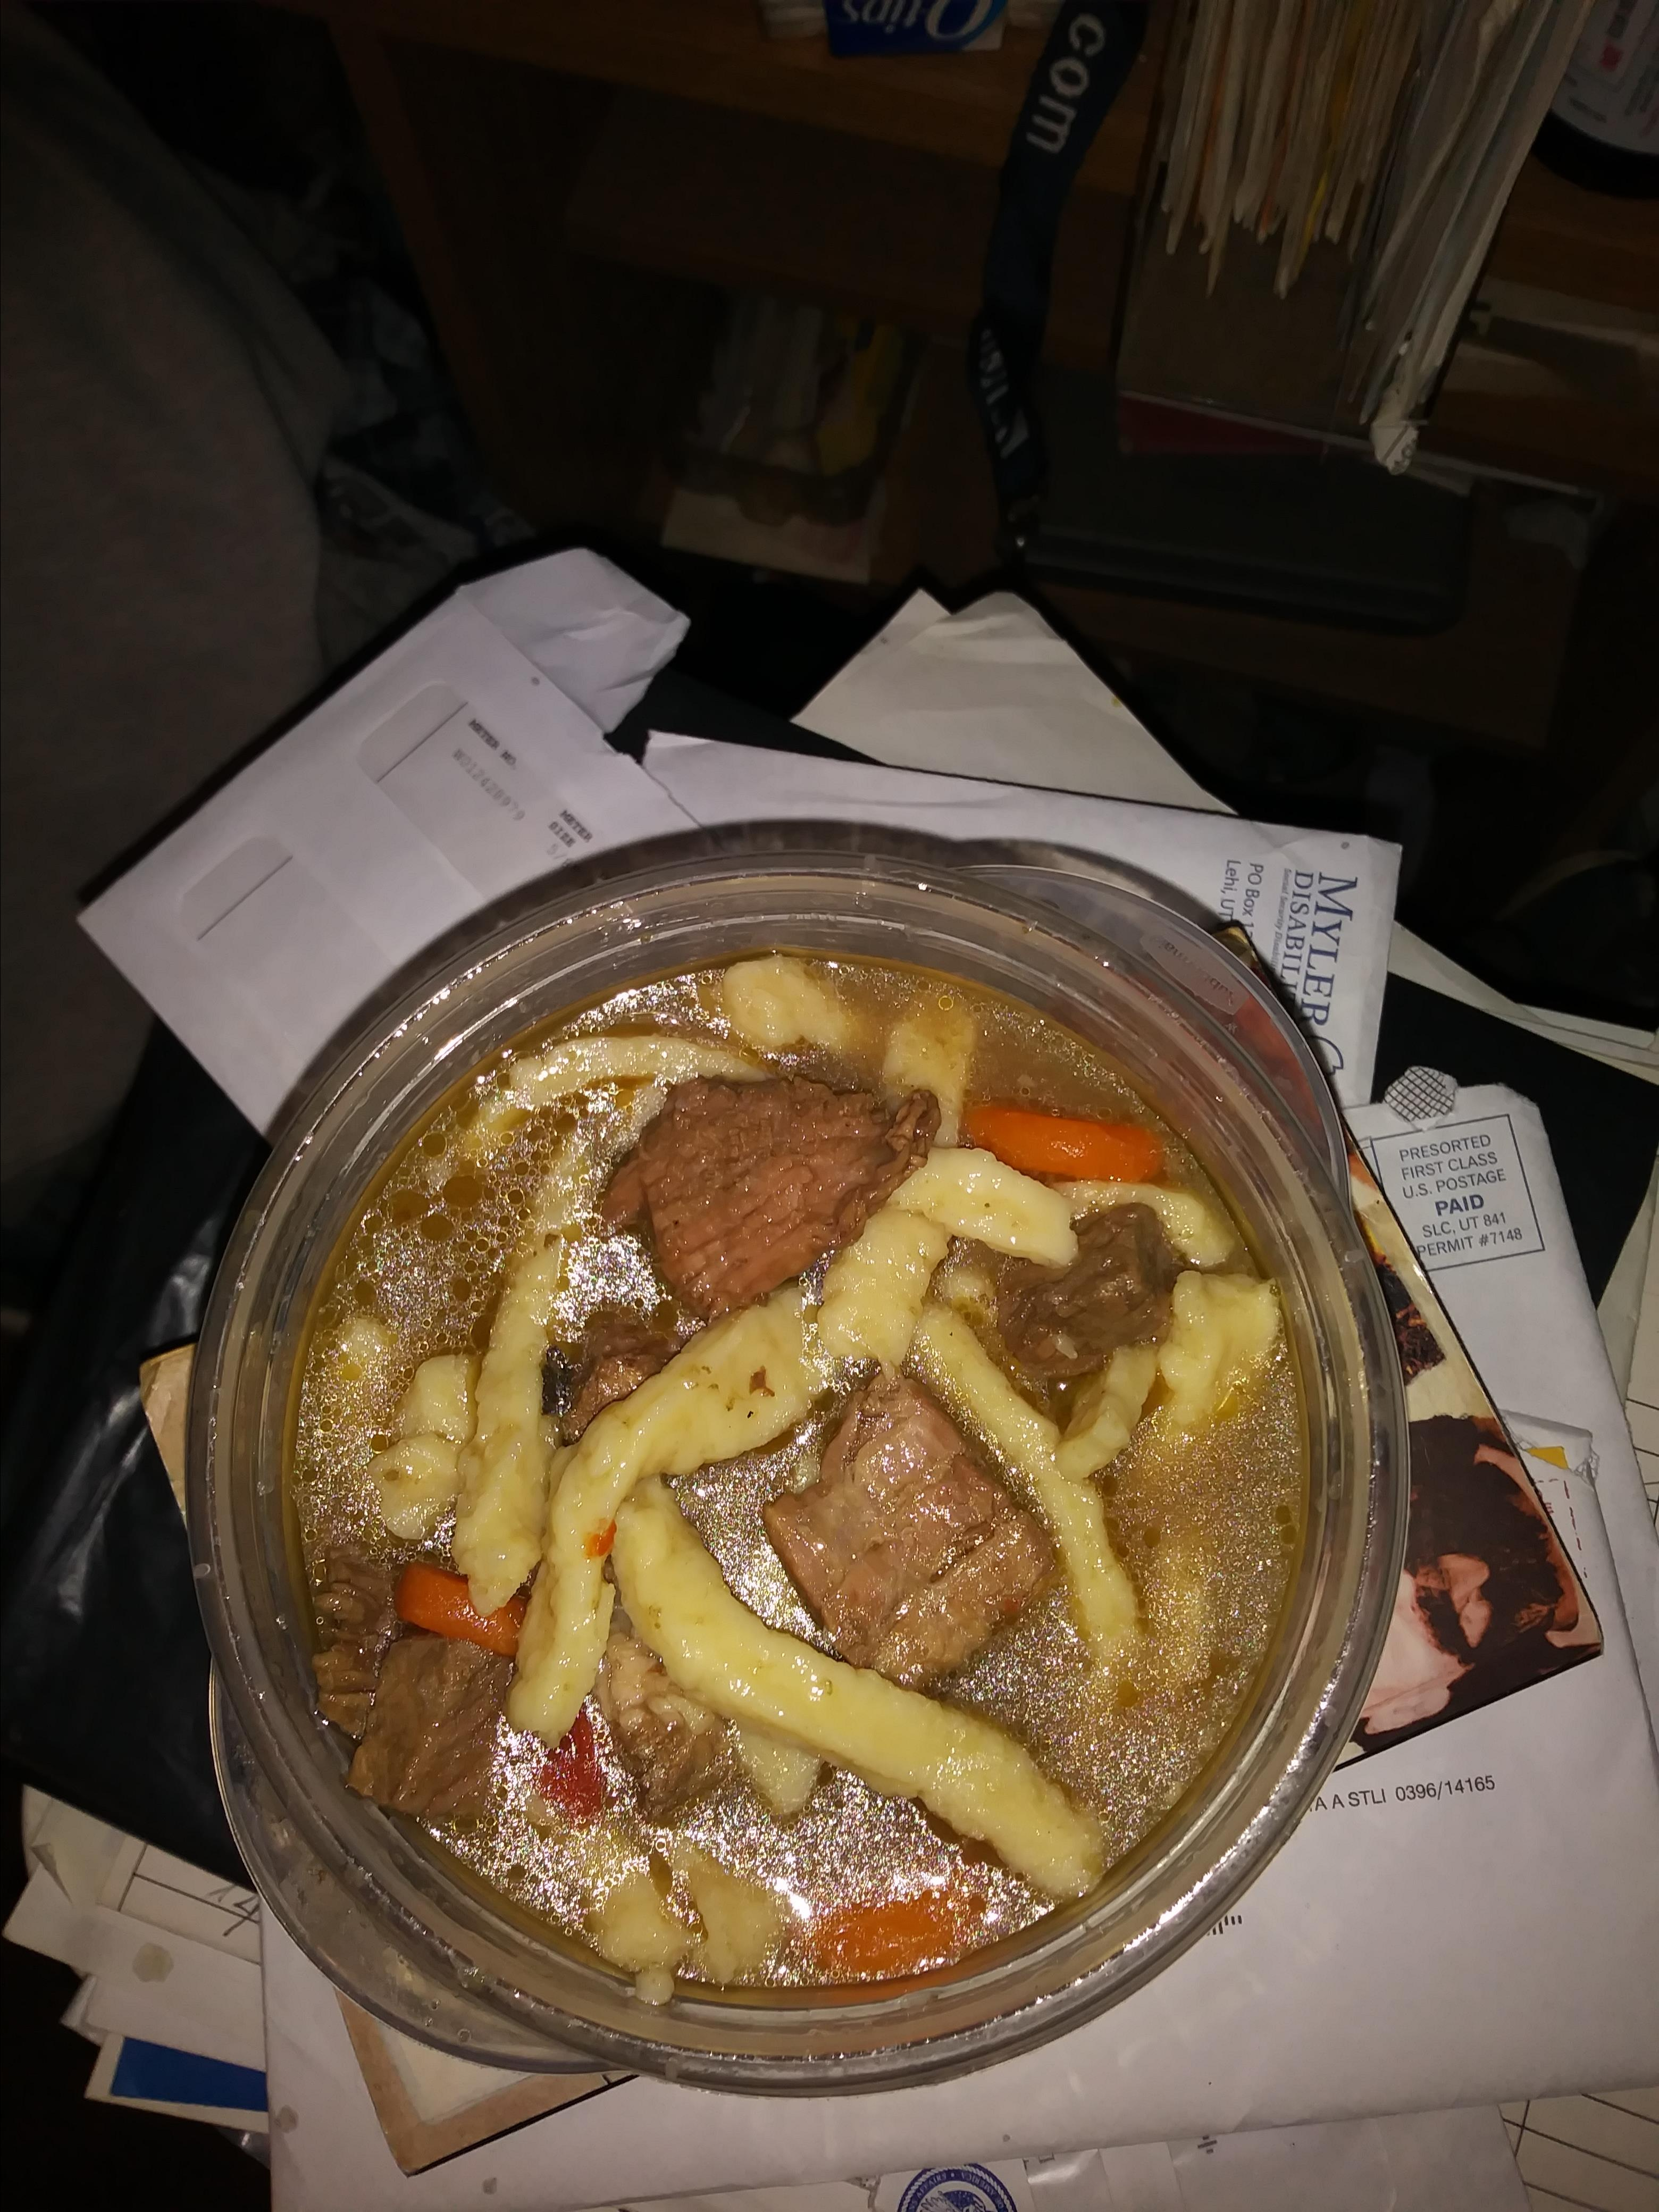 Homemade Noodles diane mayer